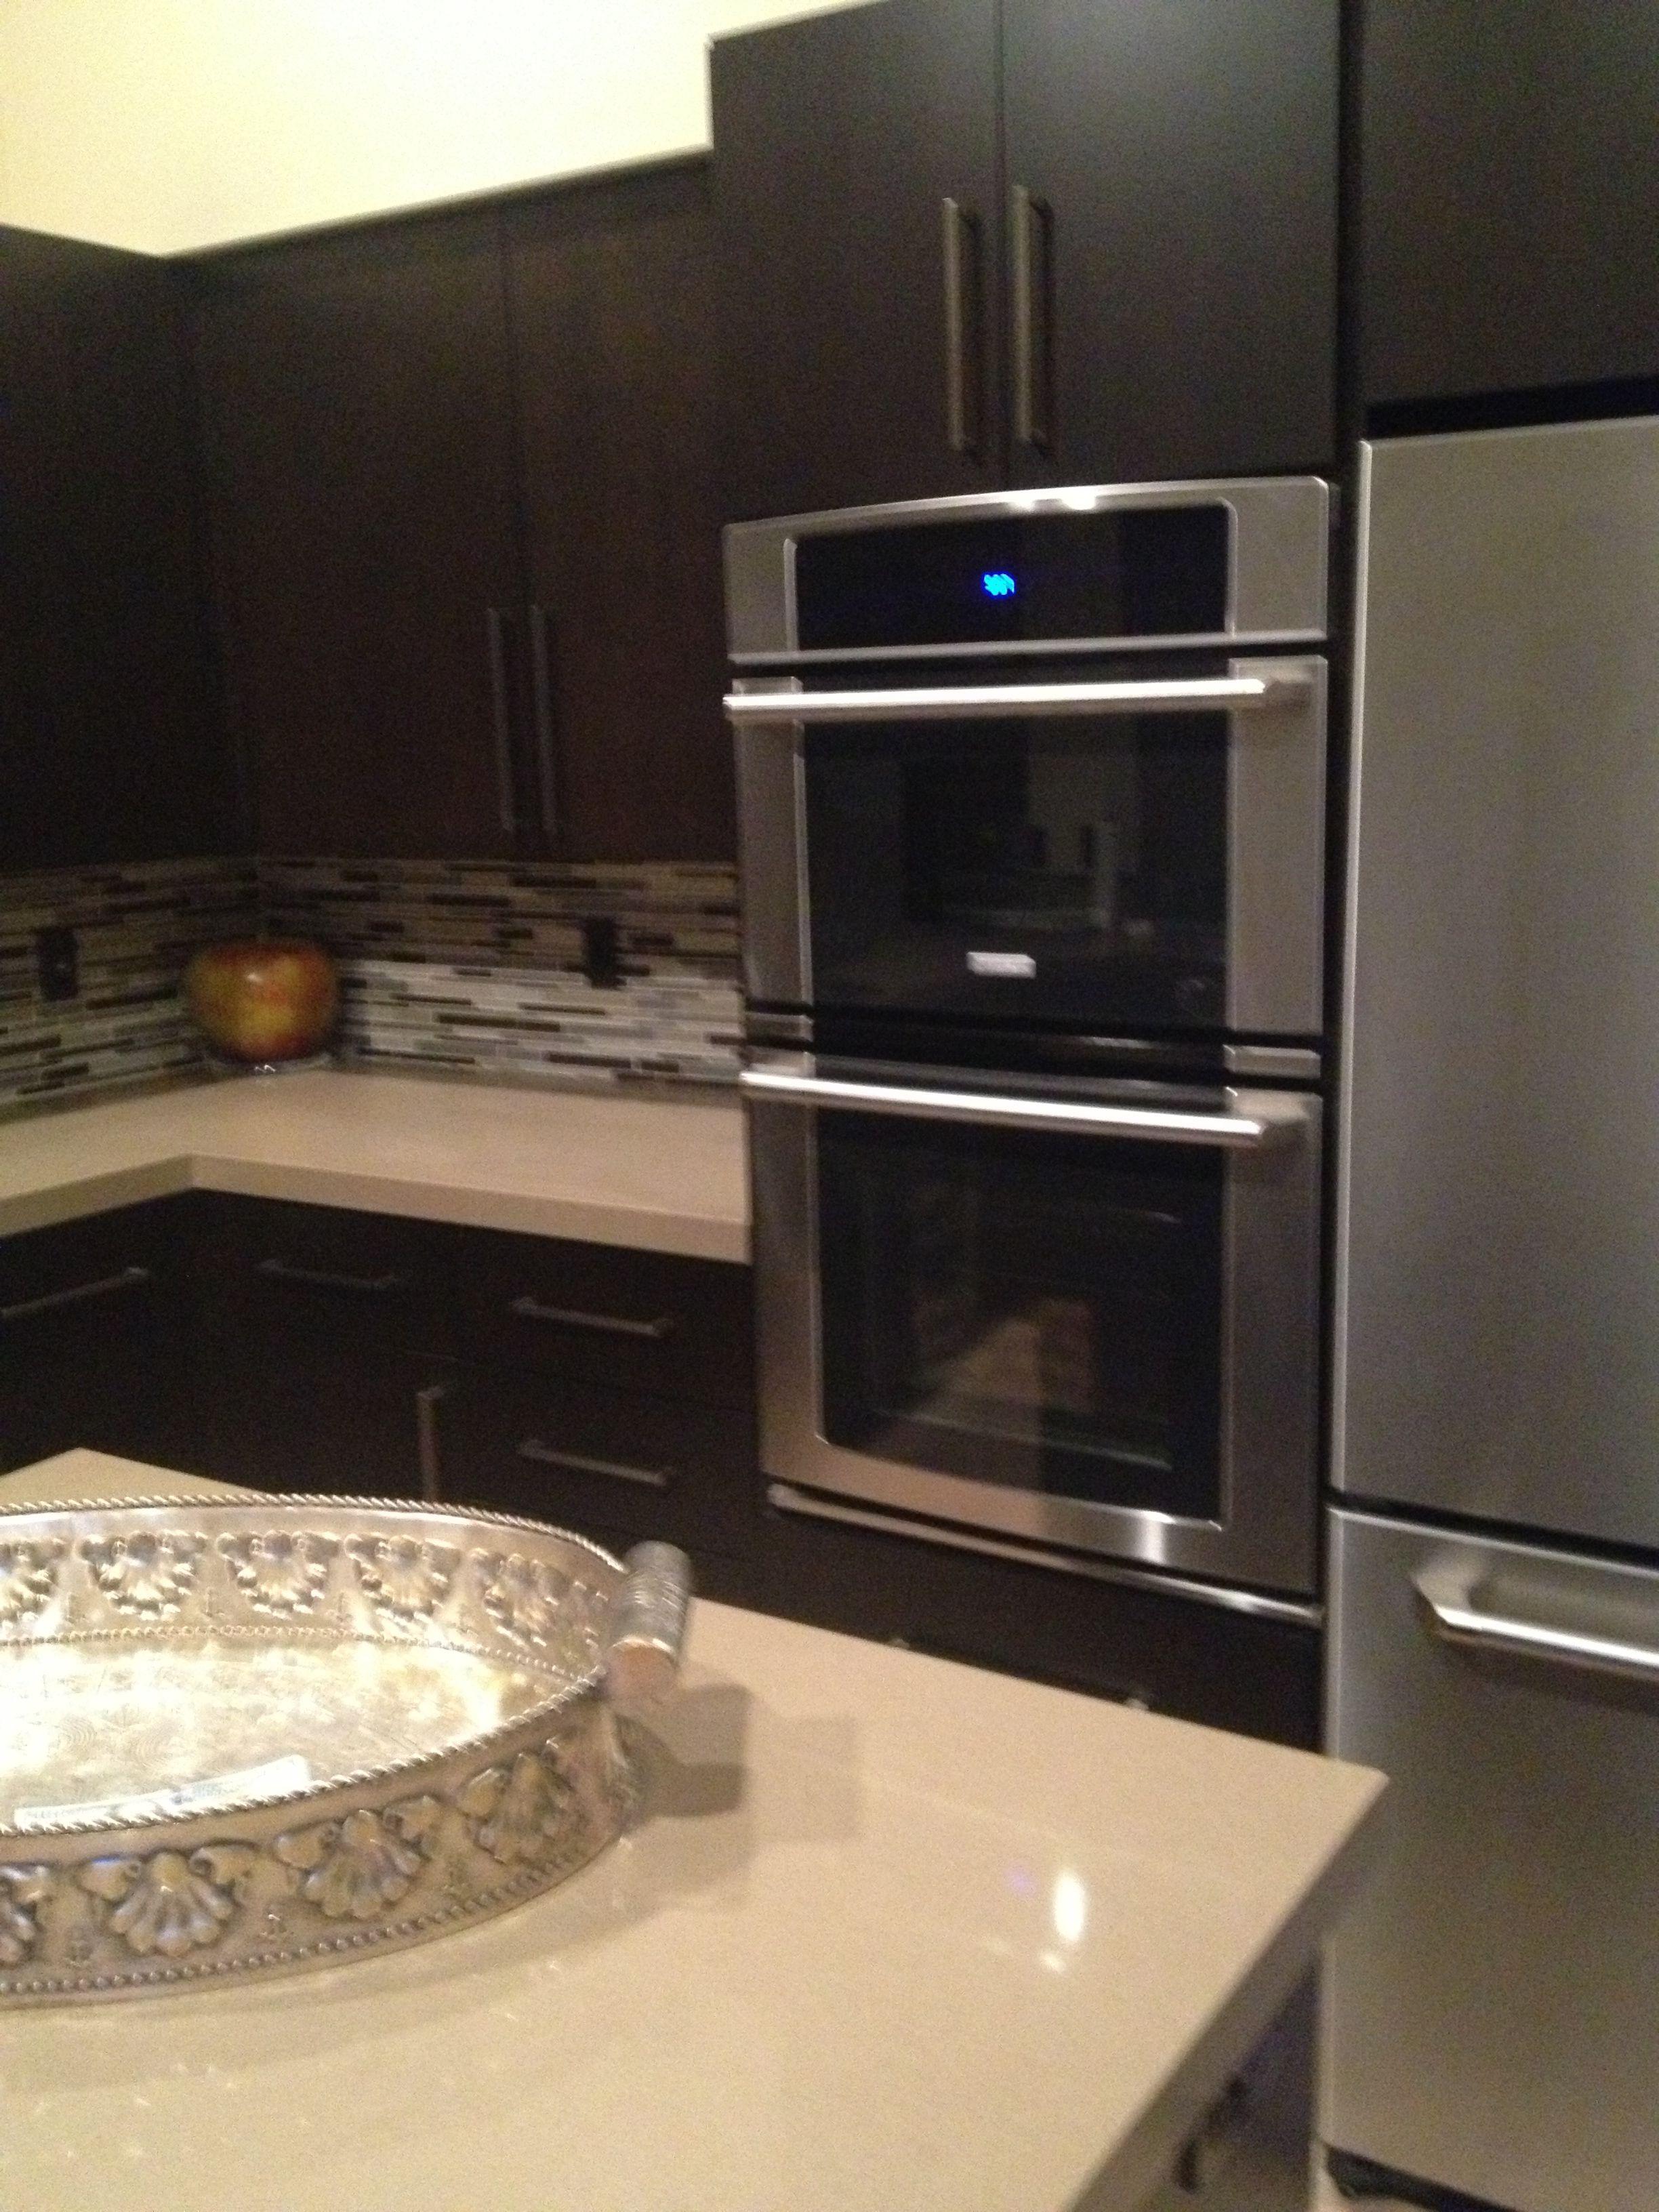 Palm Desert Retreat Kitchen Kitchen Back Splash Akdo Glass Stagger Neutral Blend Clear Ibtsdiego Kitchen Kitchen Remodel Double Wall Oven Home